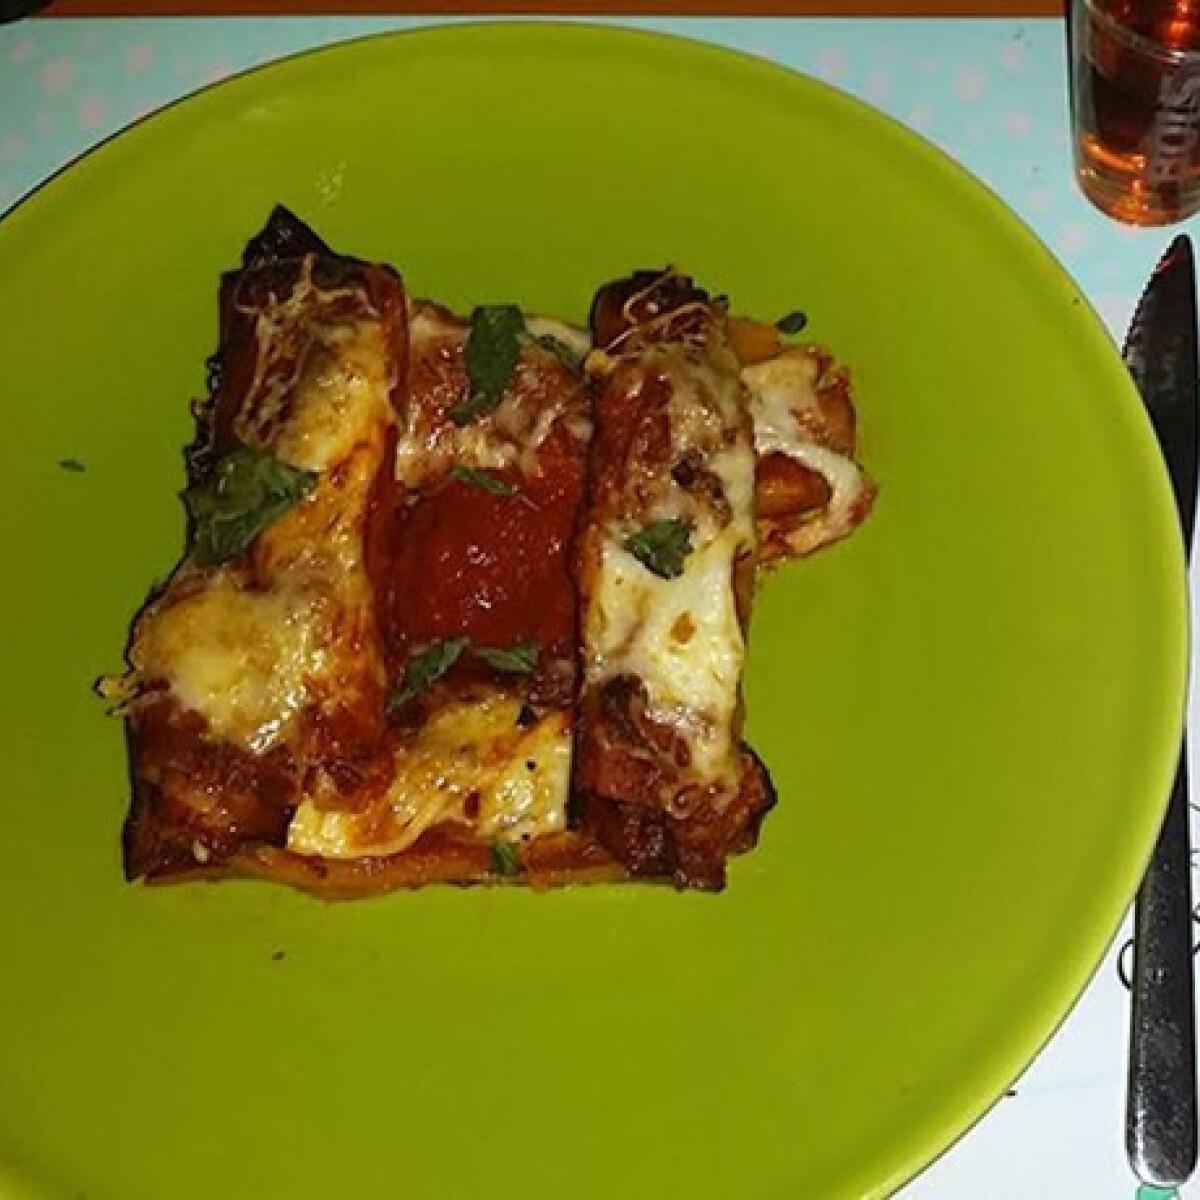 Rakott cannelloni a'la janettaylor